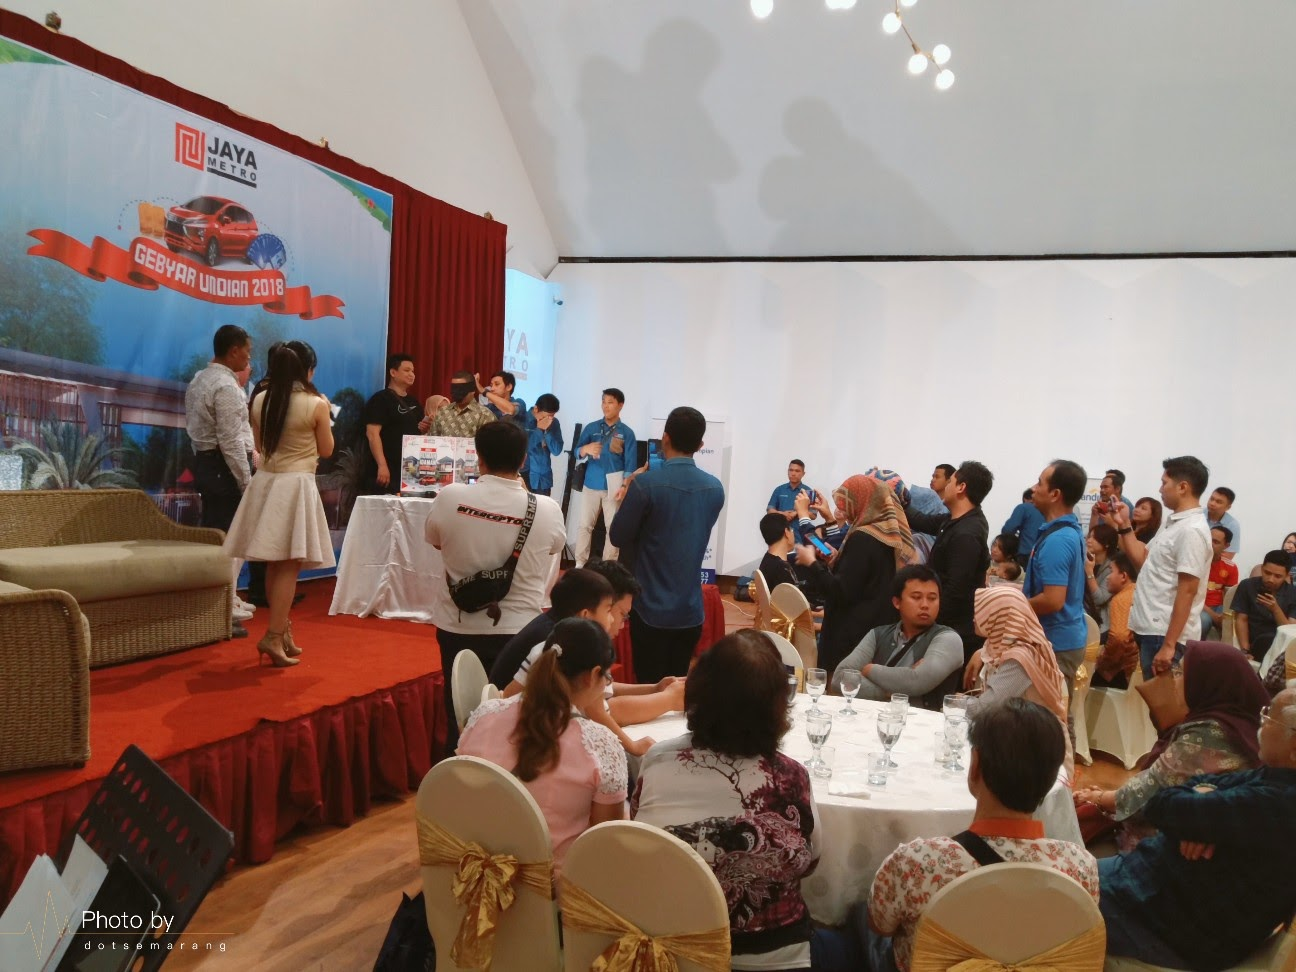 Ini Daftar Pemenang Gebyar Undian 2018 dari Jaya Metro Semarang